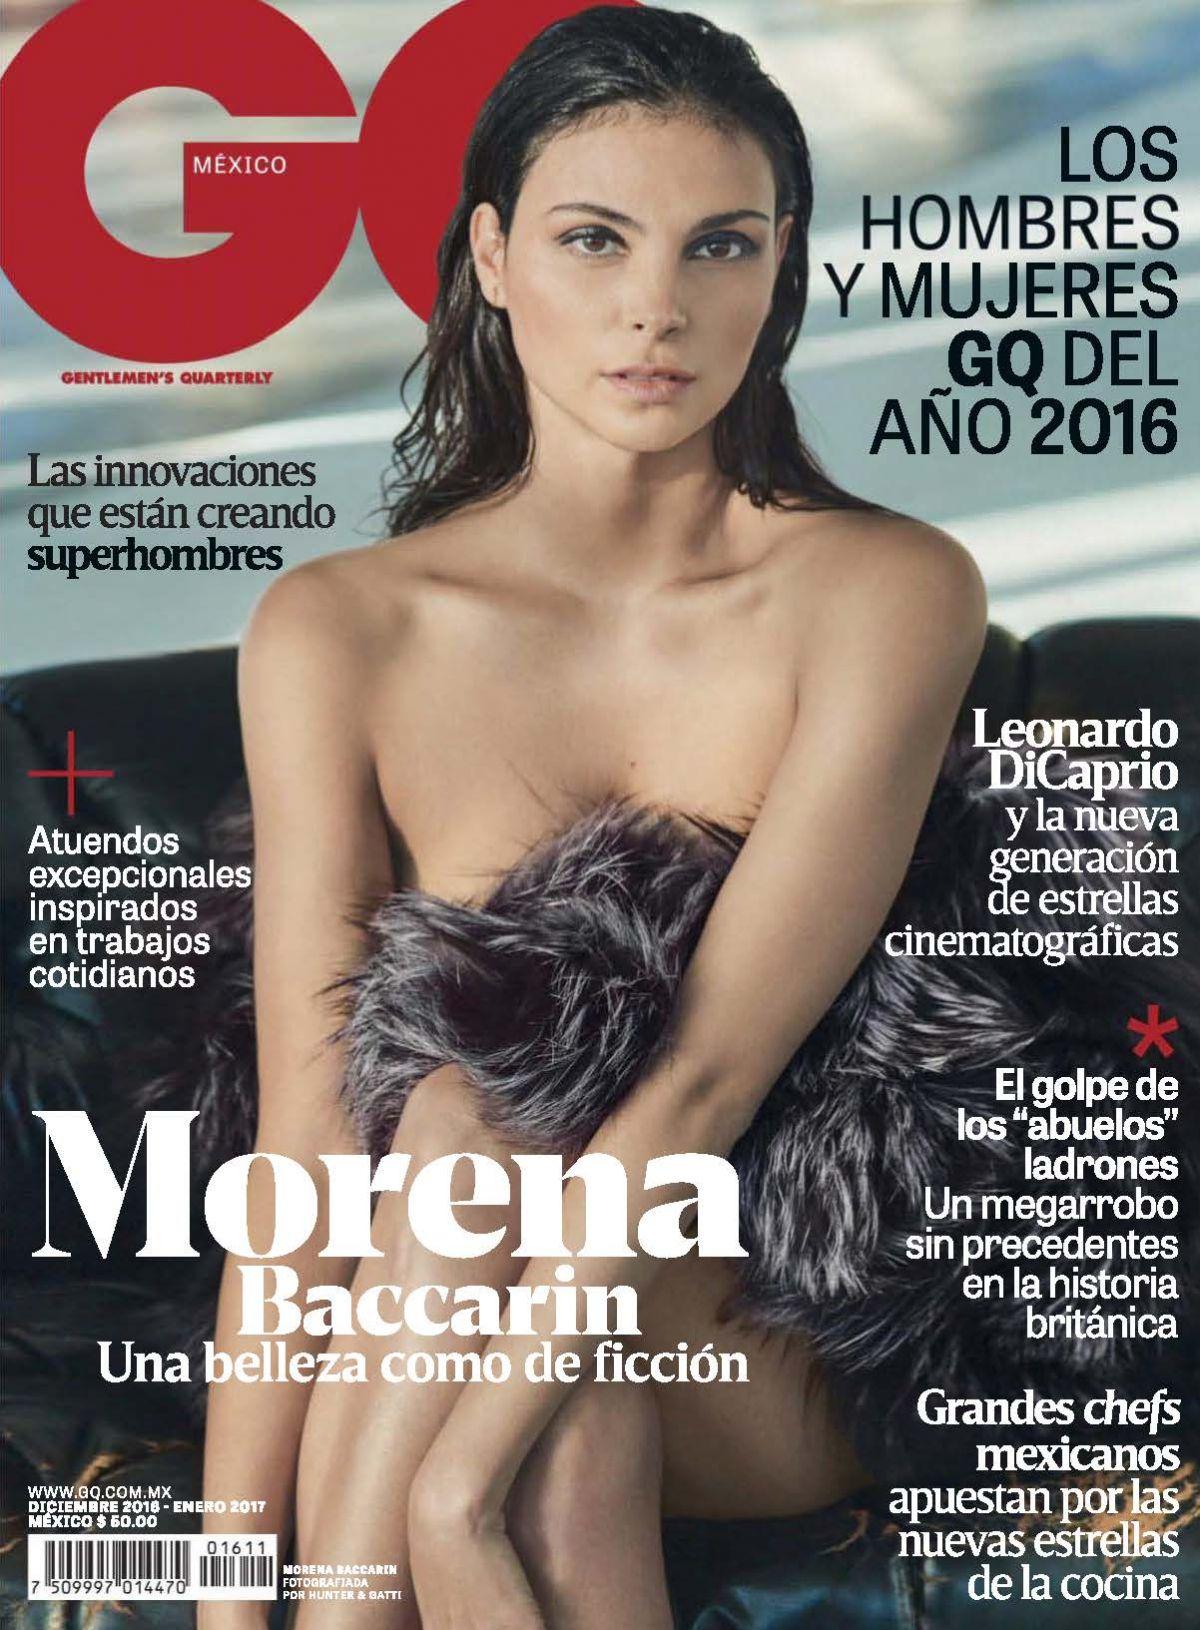 MORENA BACCARIN in GQ Magazine, Mexico December 2016